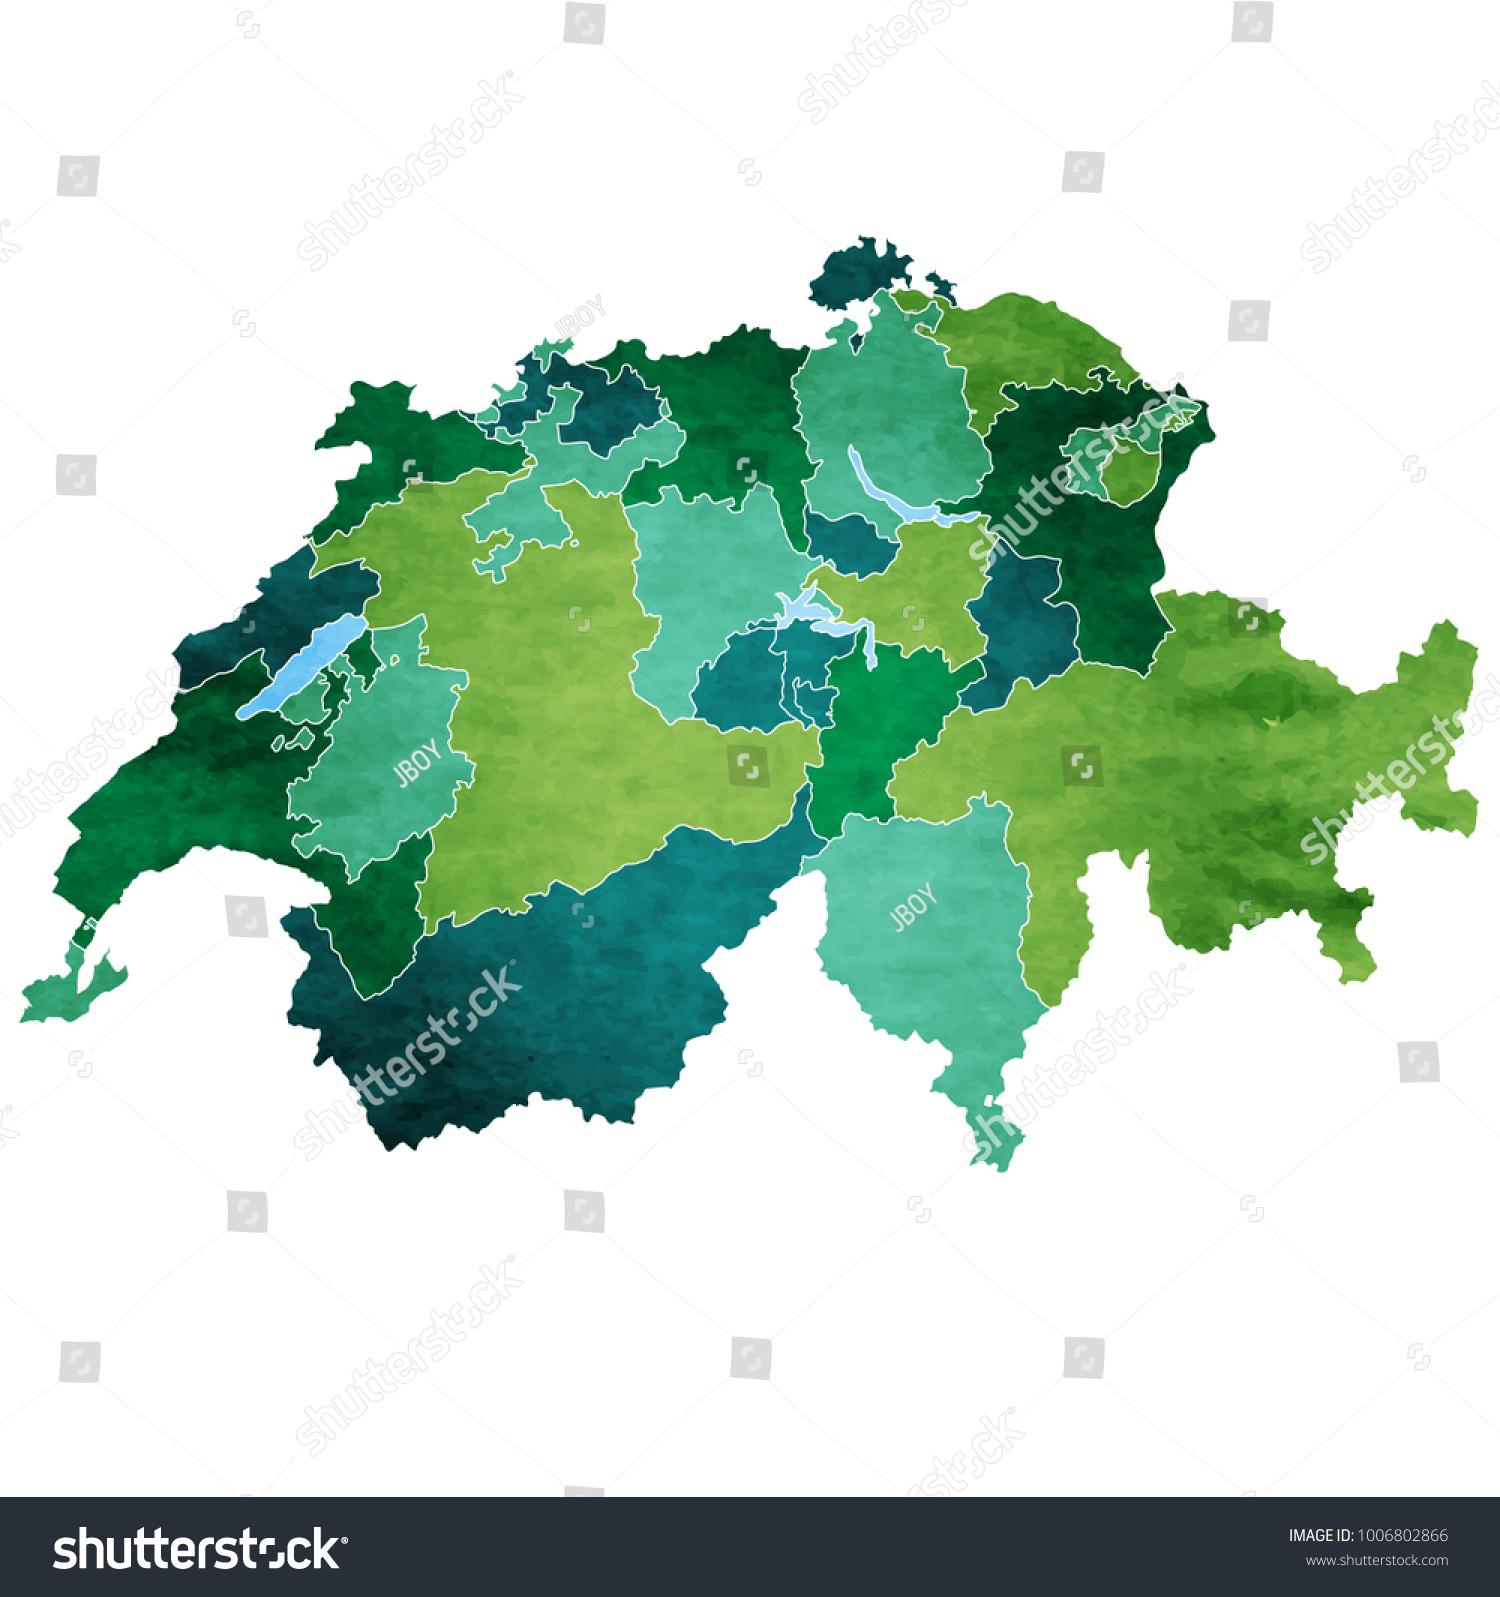 Switzerland world map country icon stock vector 1006802866 switzerland world map country icon gumiabroncs Images